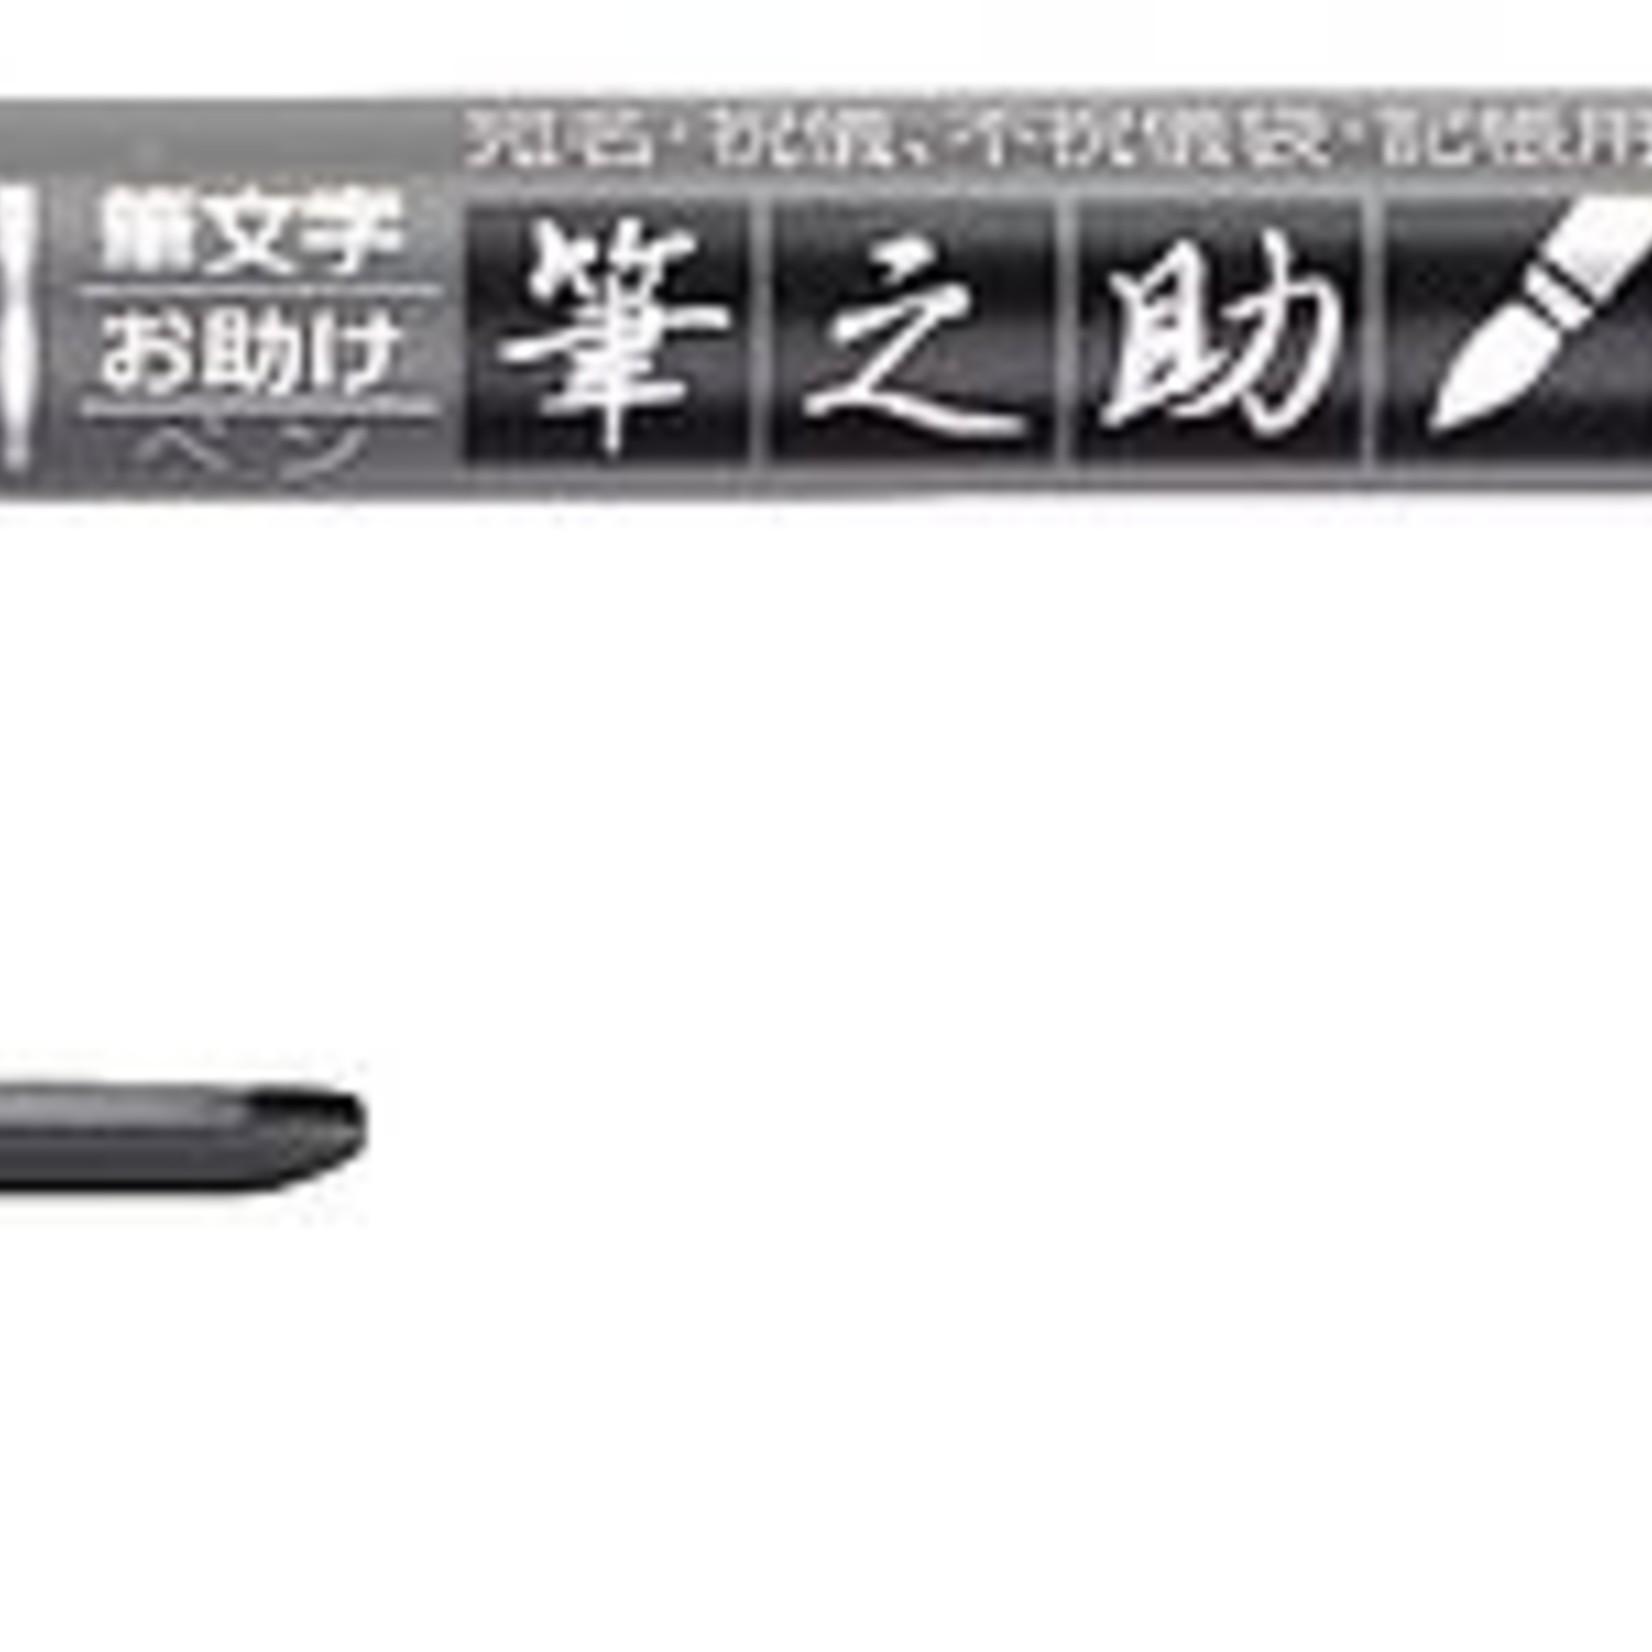 Tombow Brush Pen Fudenosuke TWIN, zwei weiche Spitzen